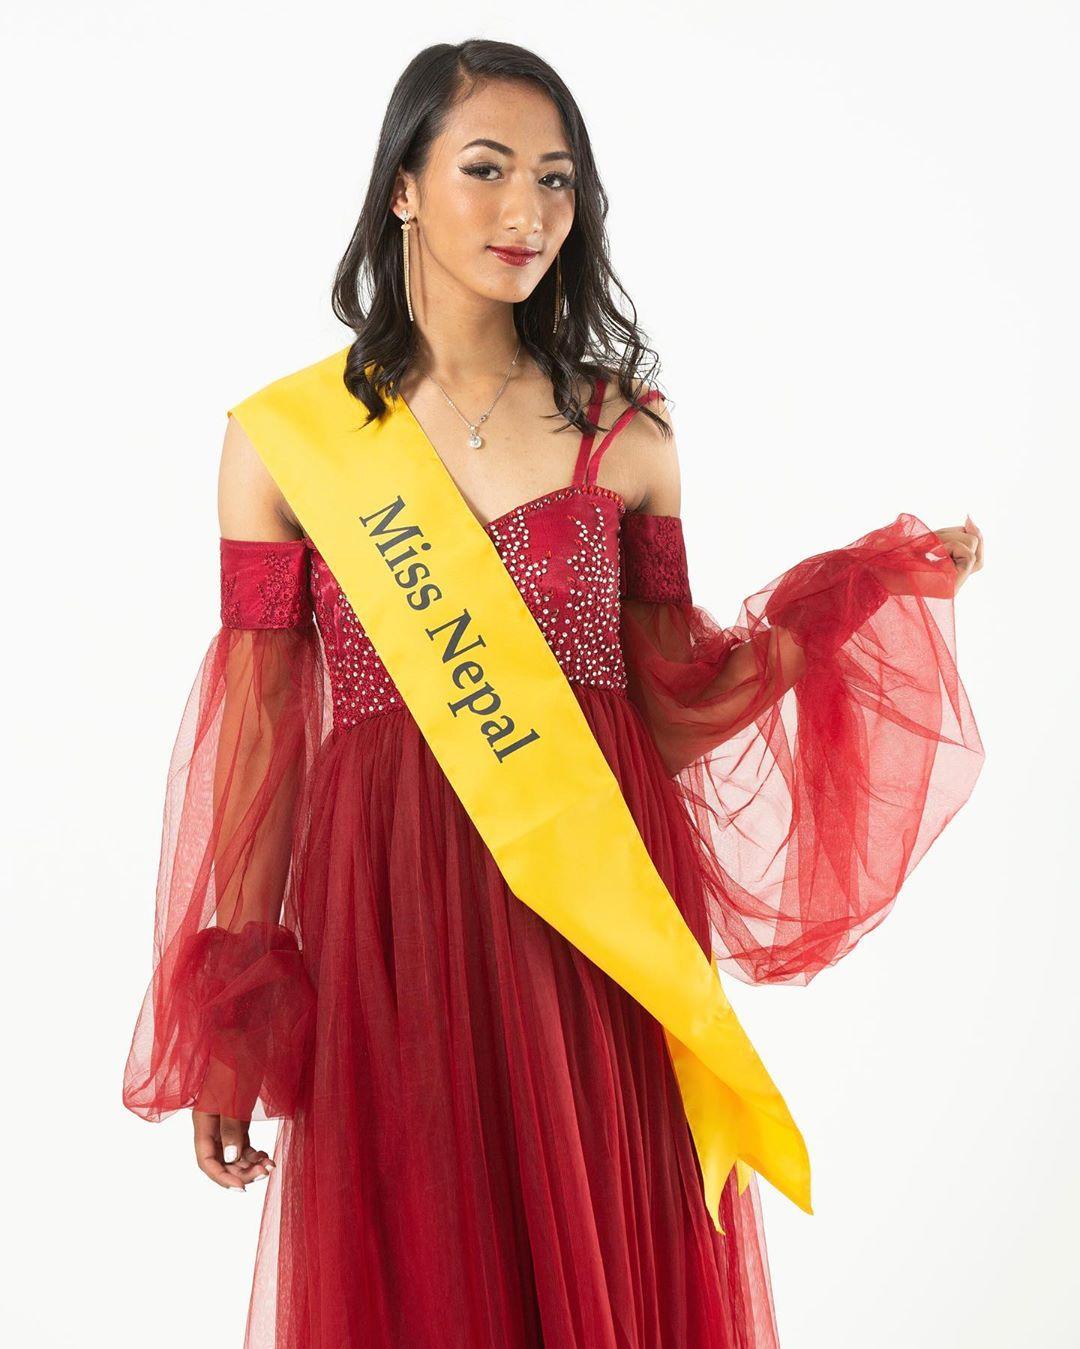 miss latvia vence miss great 2019. 1kODzE